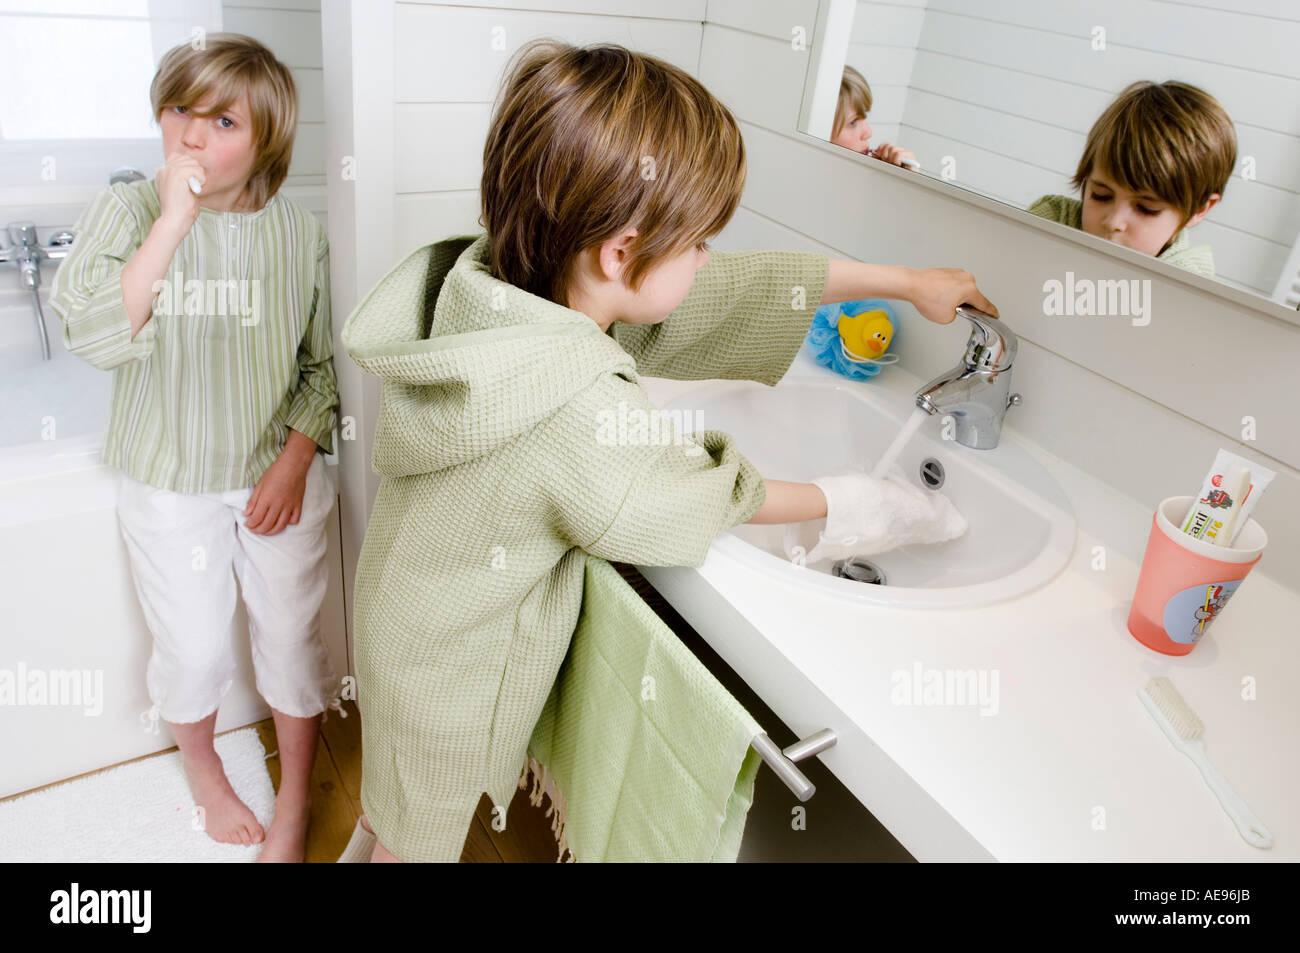 2 Kinder im Badezimmer Stockfoto, Bild: 7776682 - Alamy